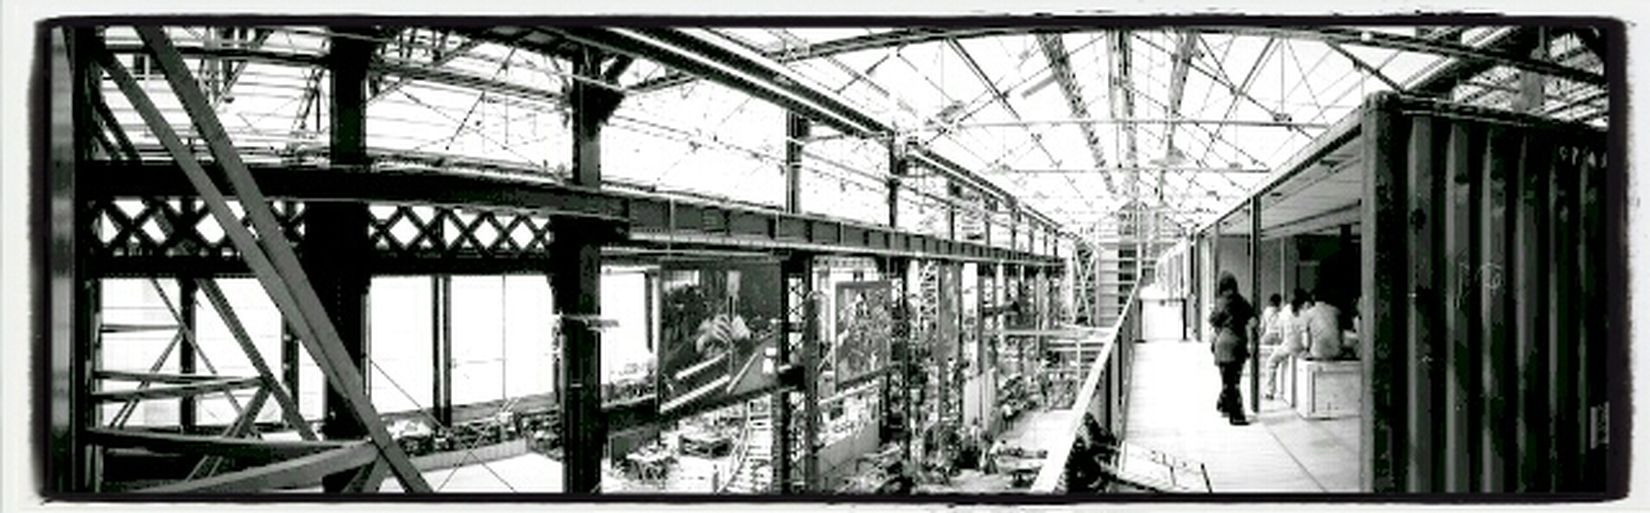 Urban Blackandwhite Panorama Machines De L'Ile